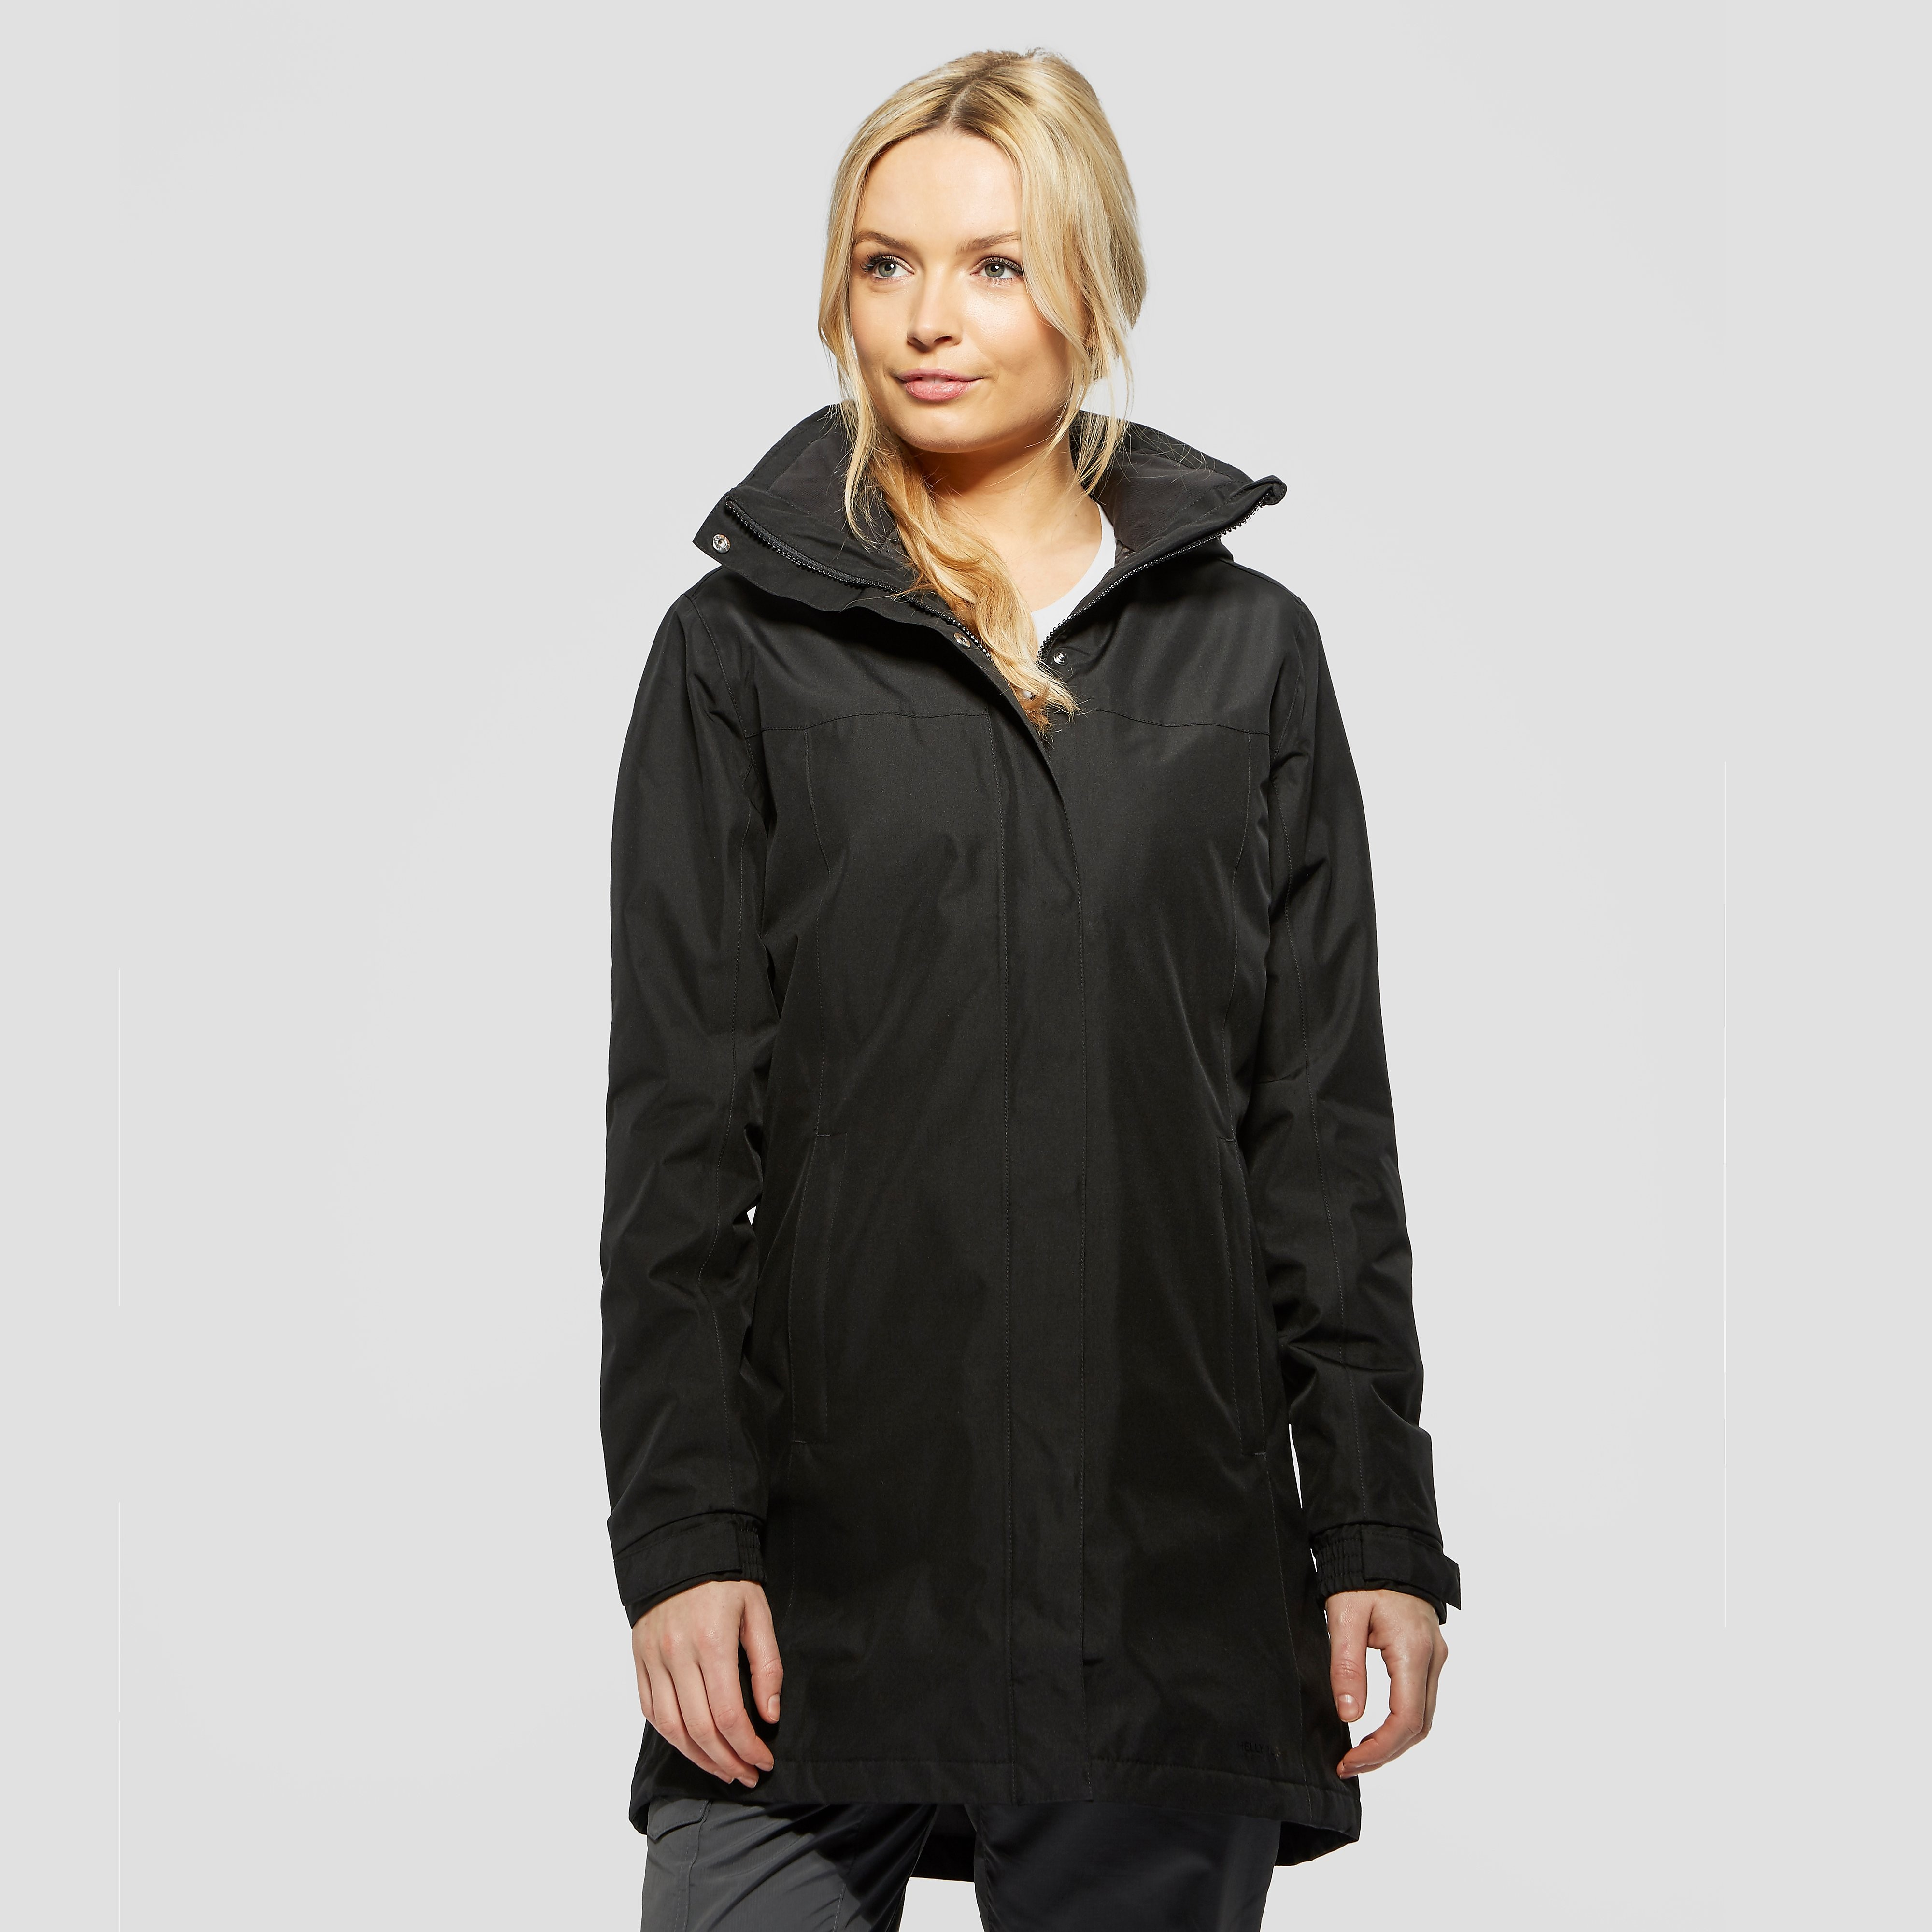 Helly Hansen Women's Aden Long Insulated Jacket